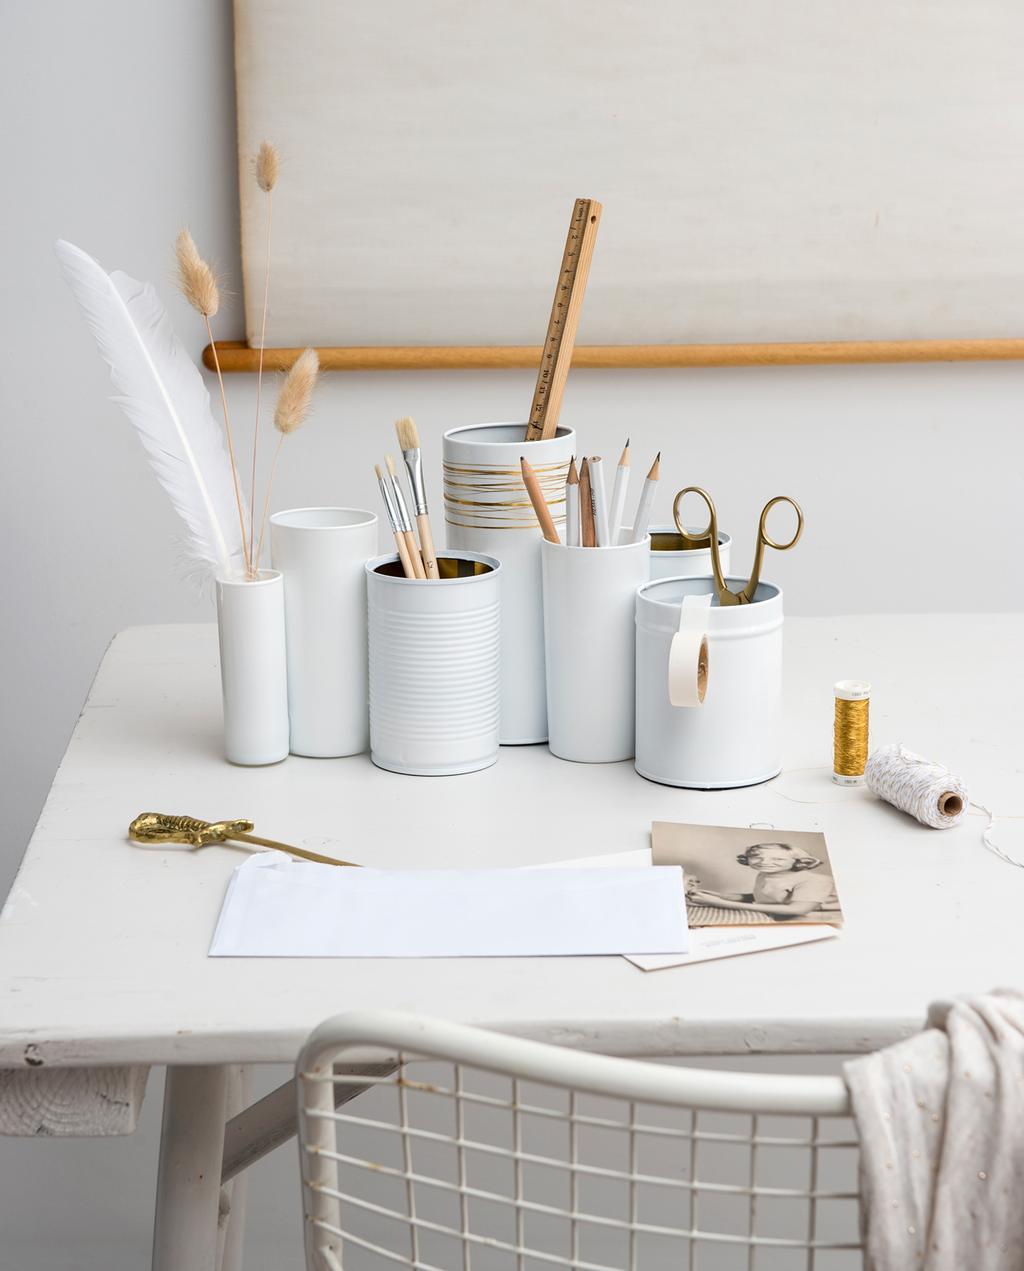 vtwonen 1-2020 | DIY small pennenbakje goud accent